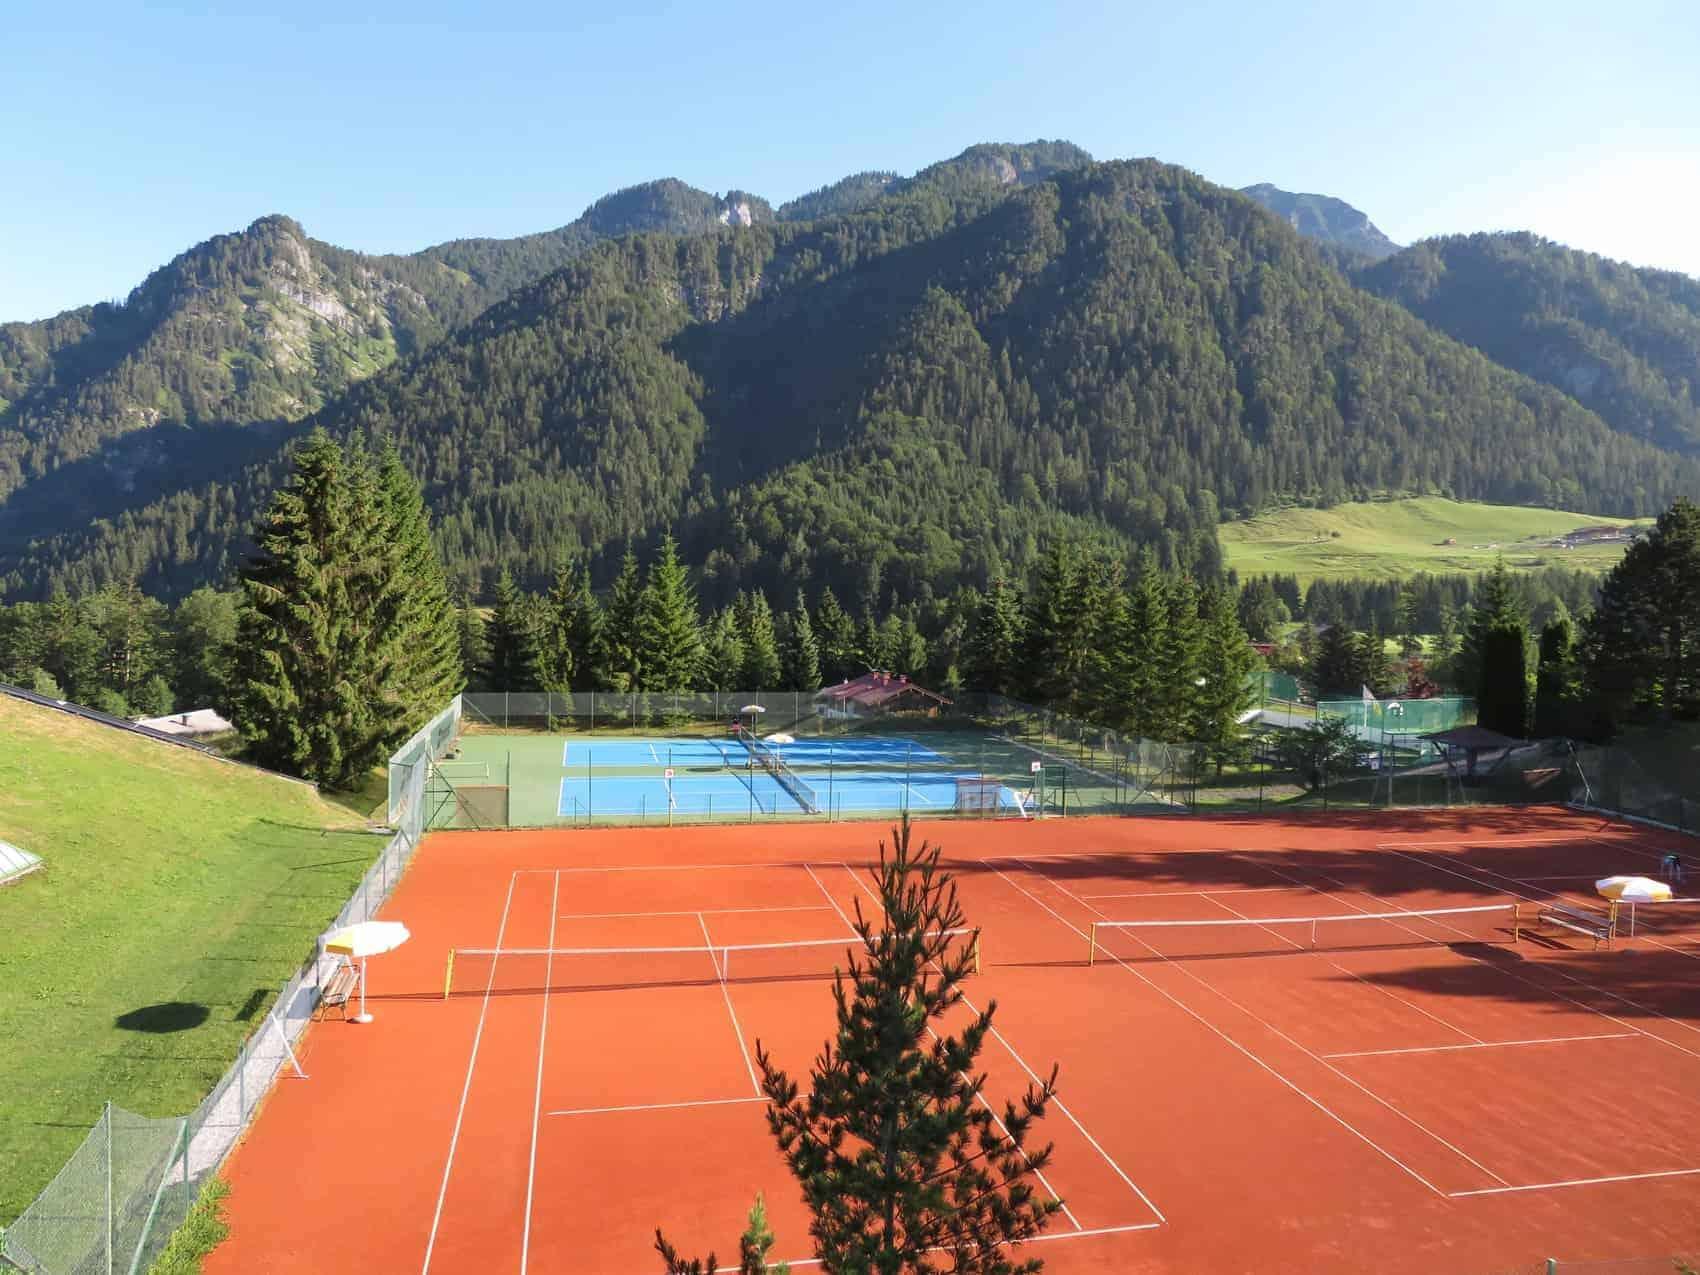 Laerchenhof tennis